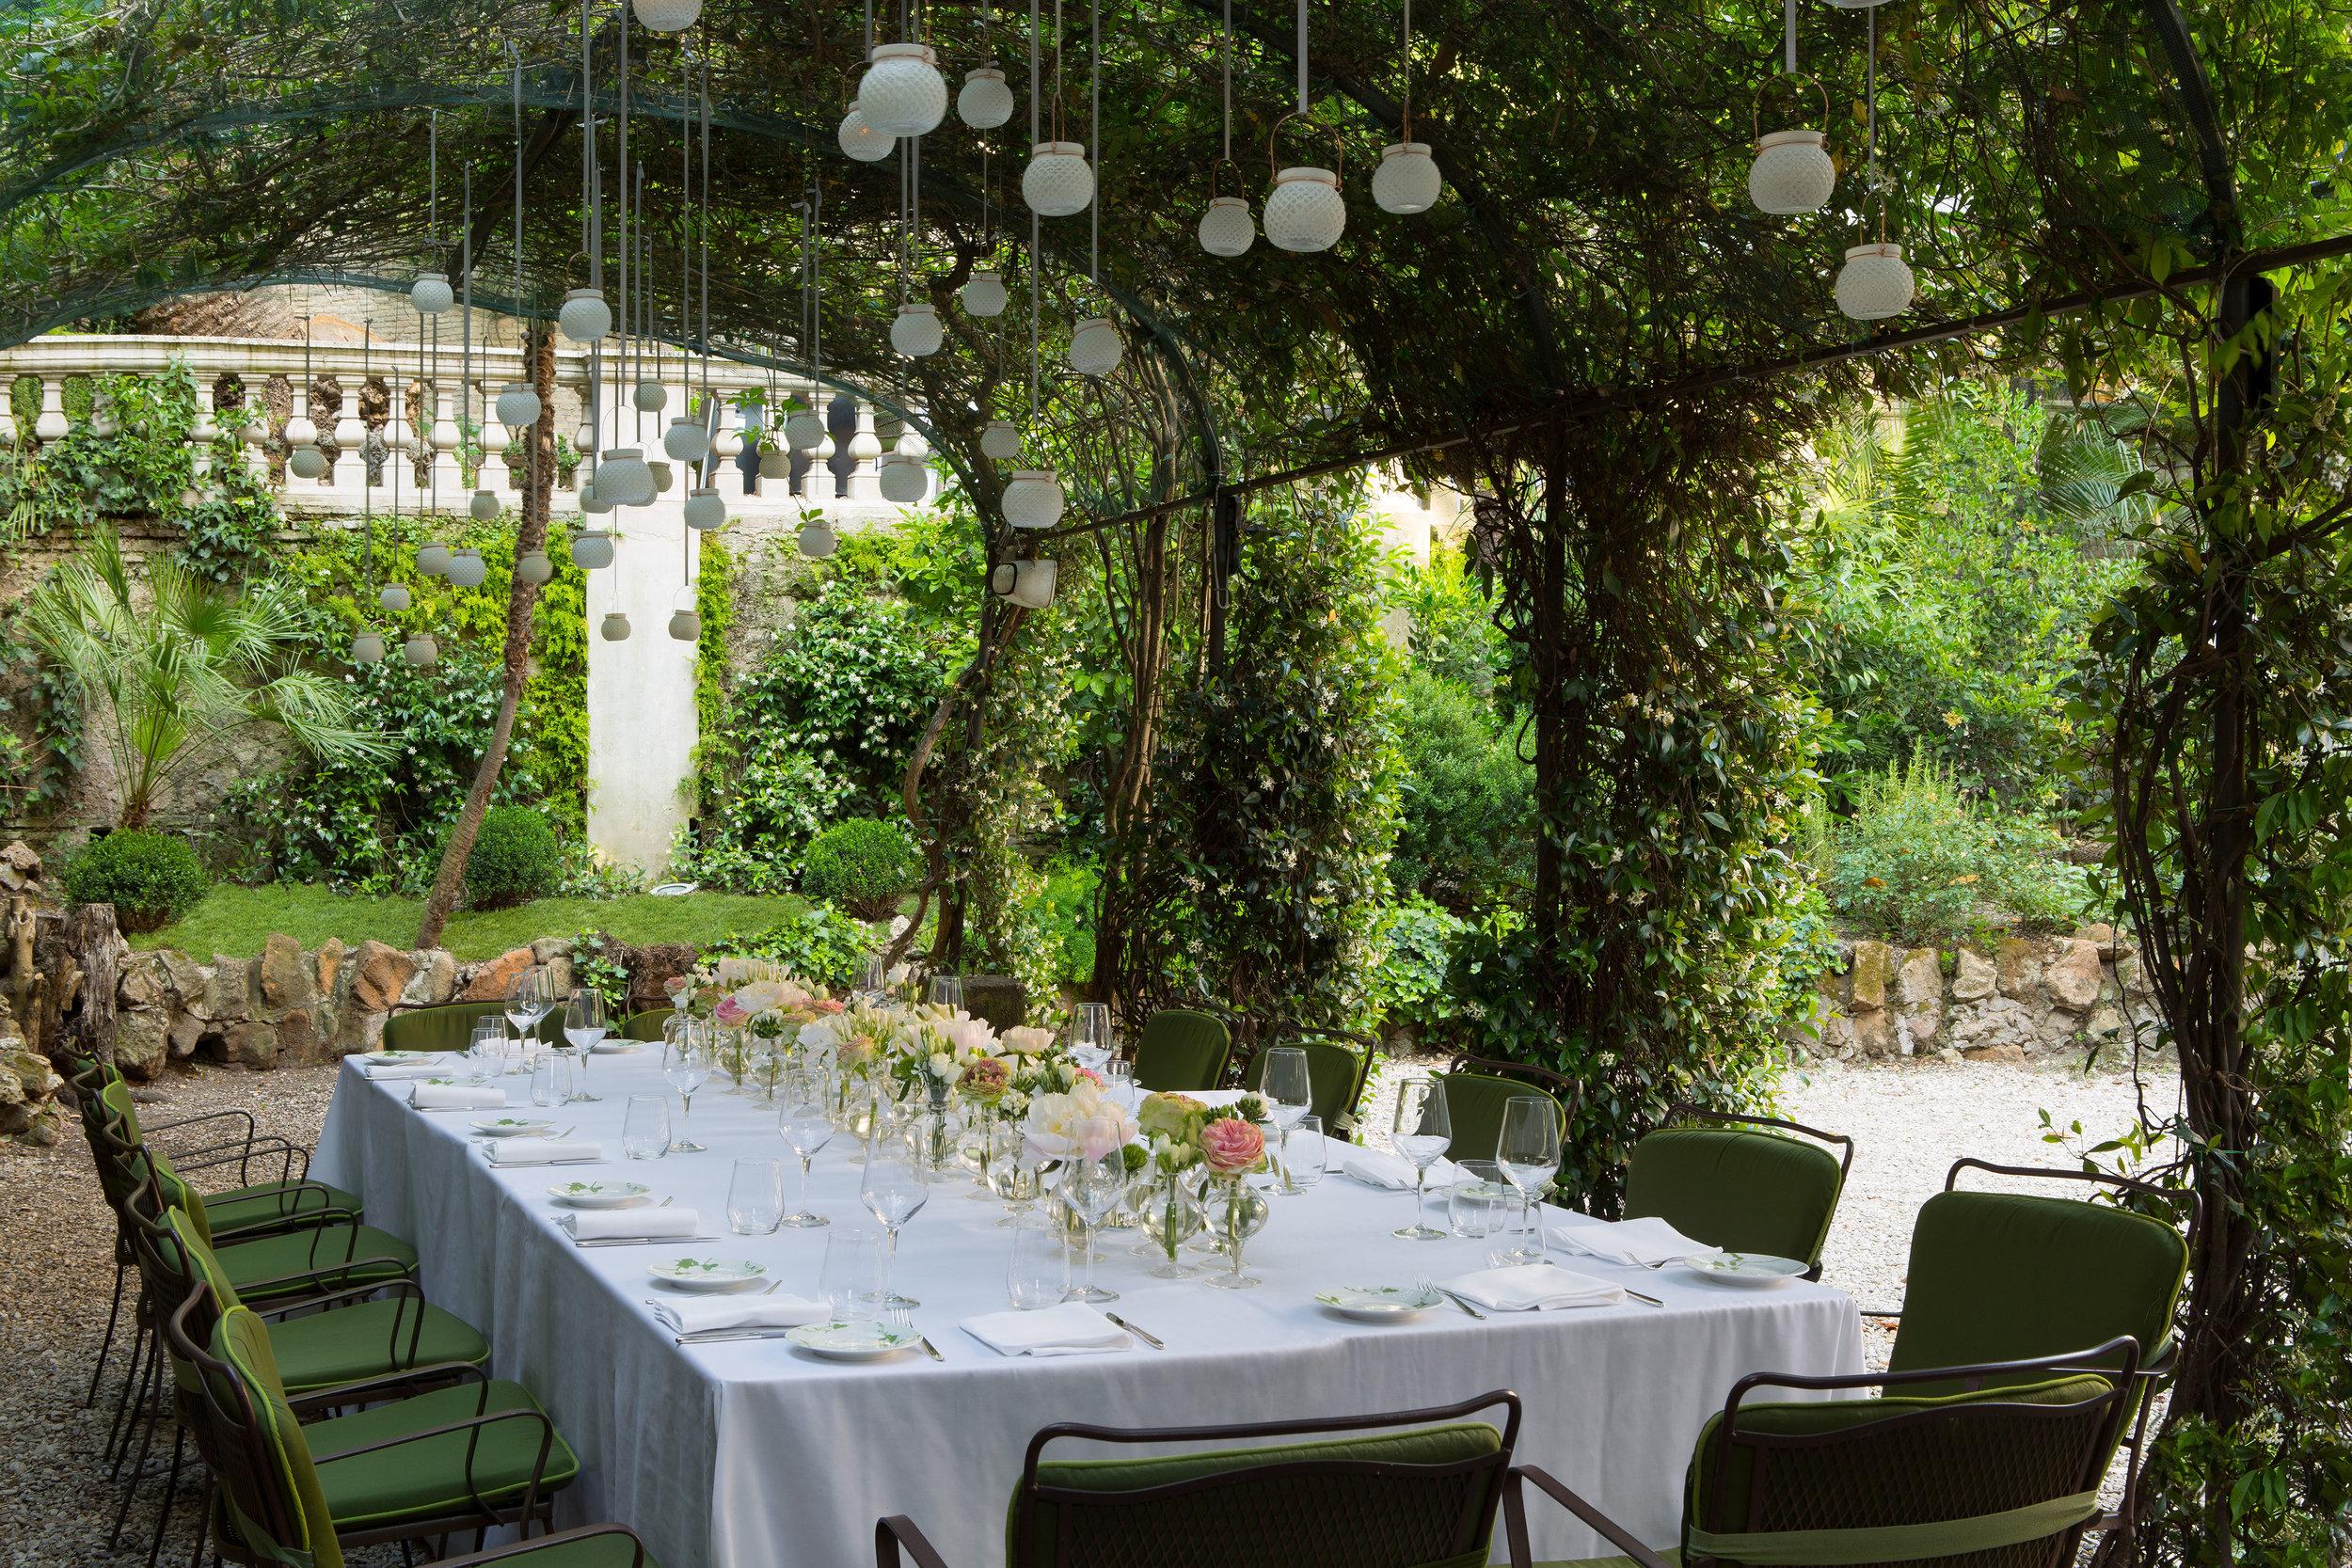 5 RFH Hotel de Russie - Pergola in the Secret Garden 0815 May 17.JPG